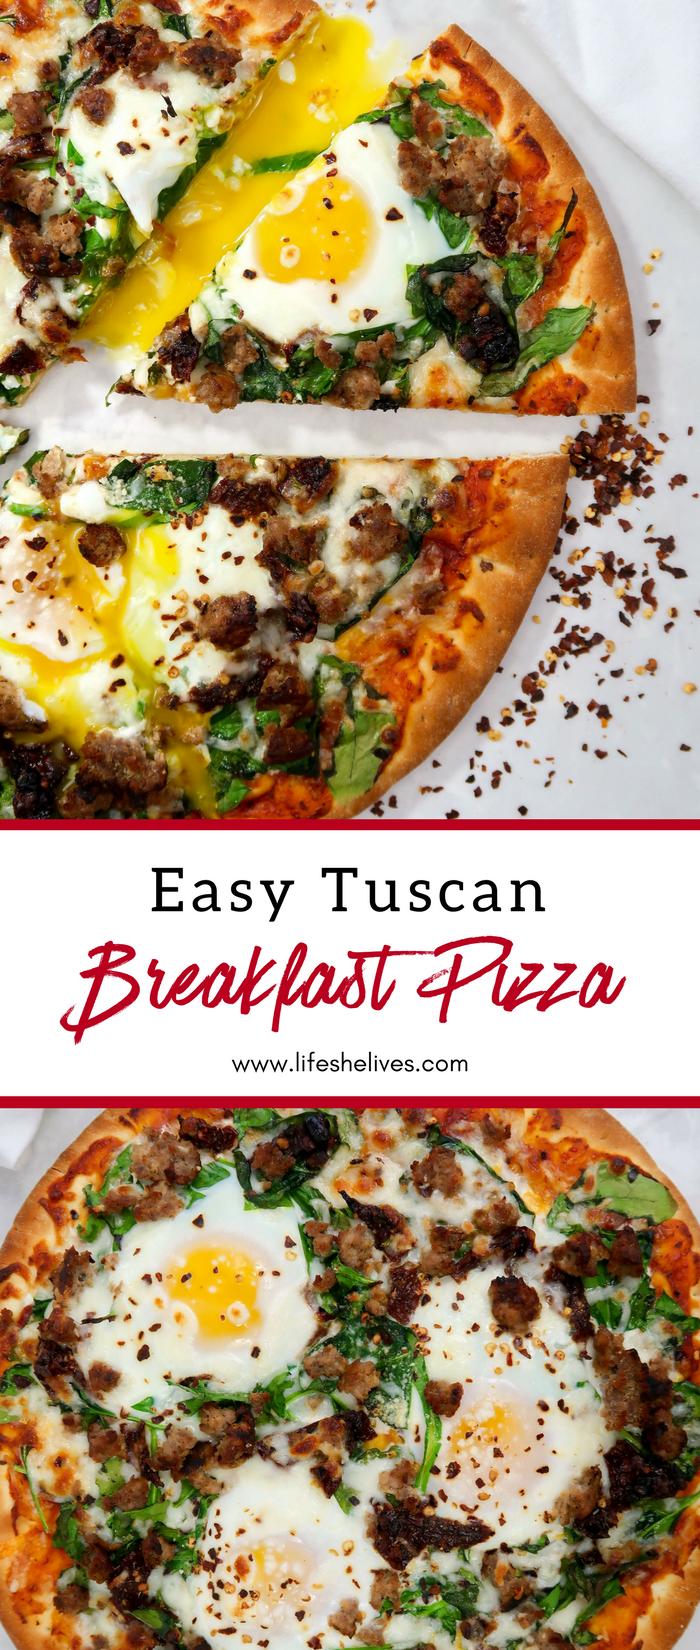 Easy Tuscan Breakfast Pizza | Breakfast Recipes | Breakfast Pizza | Pizza For Breakfast | Pizza Recipes